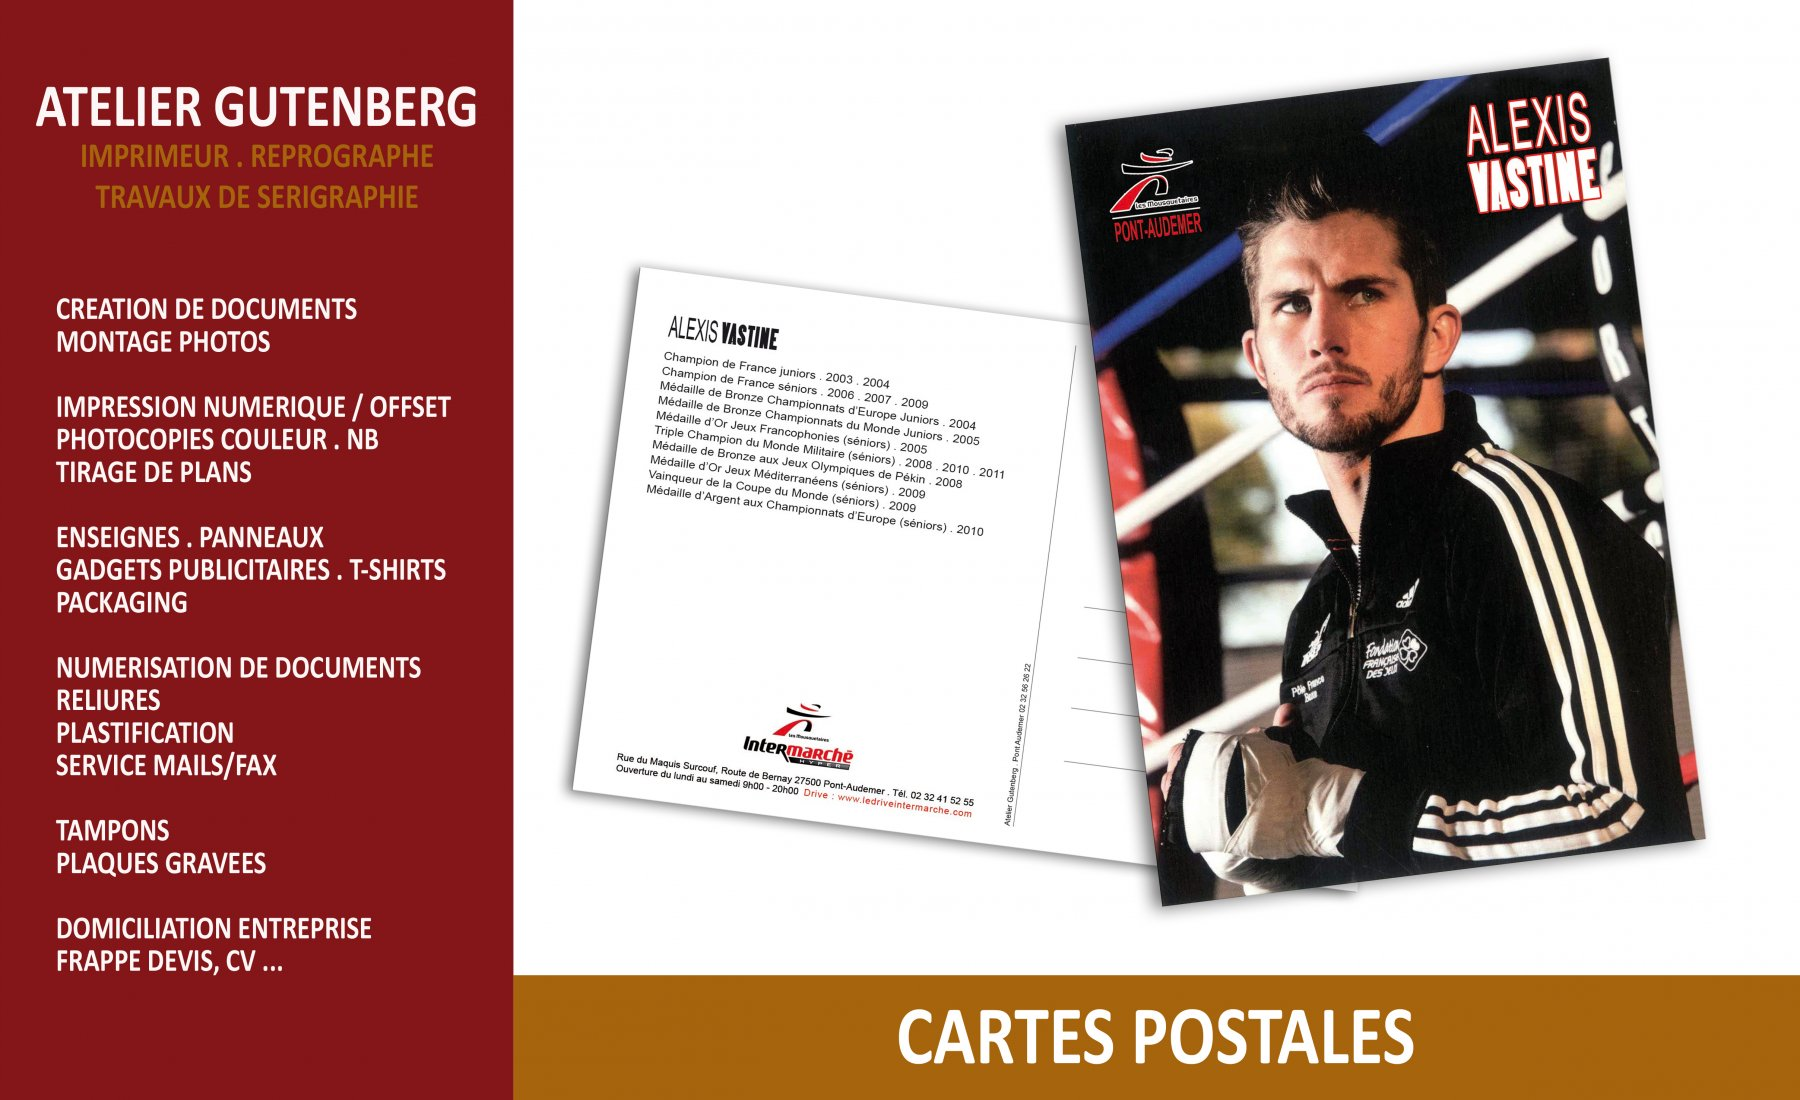 ateleir gutenberg cartes postales recto verso sur couché 350 gr avec pelliculage brillant recto